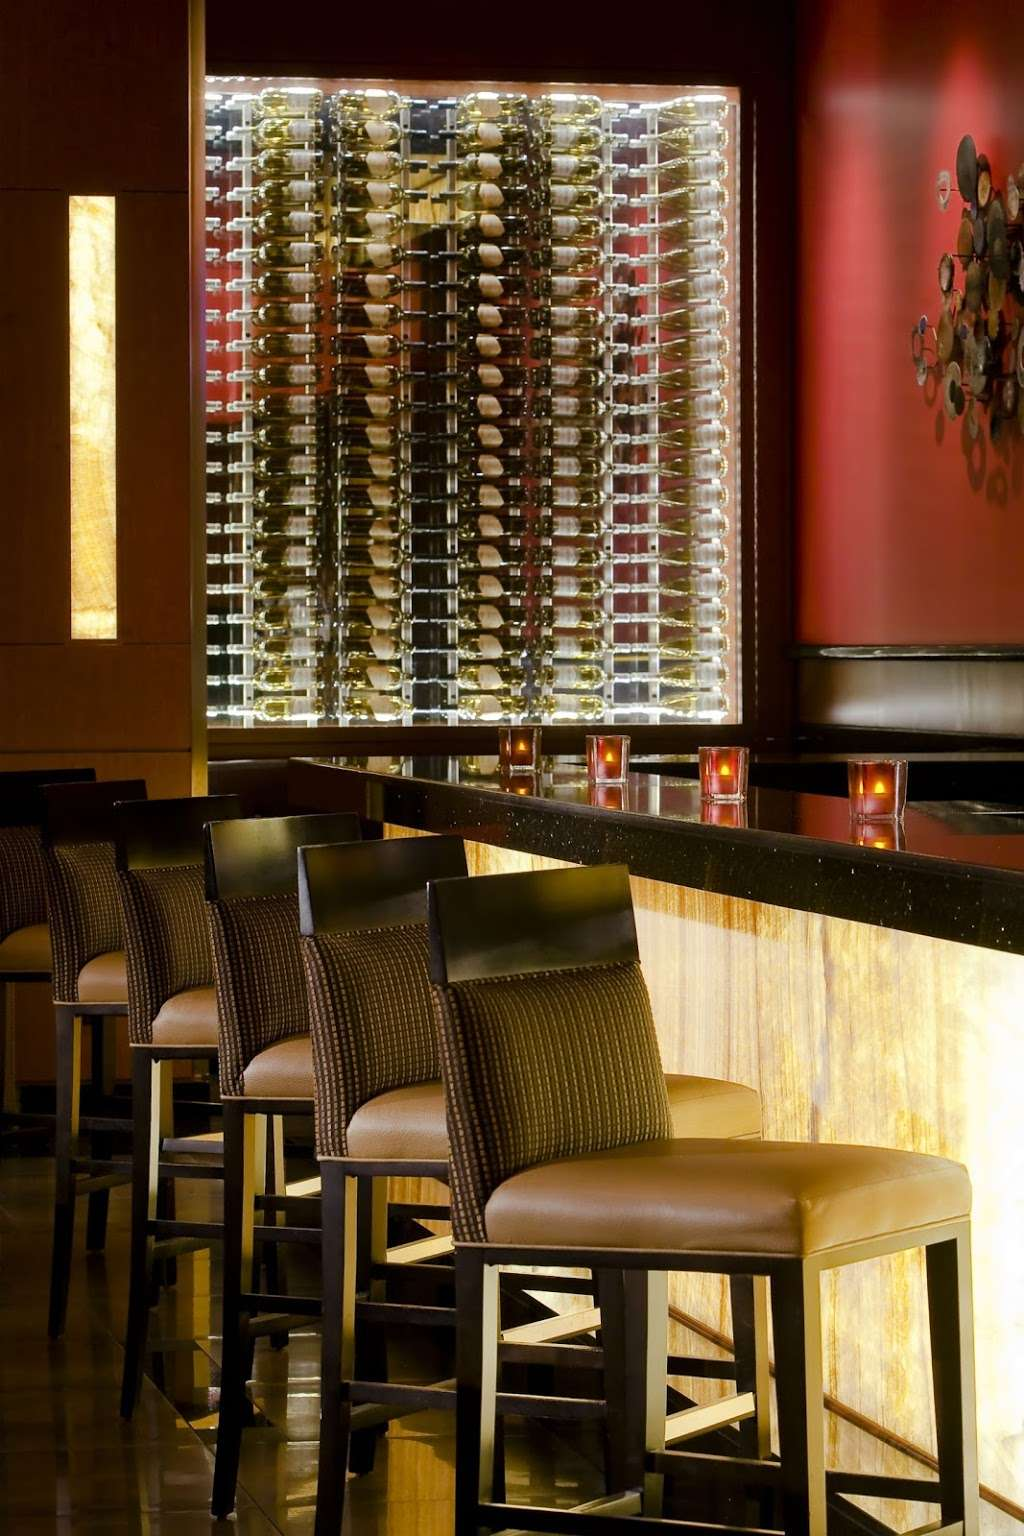 Pancetta - restaurant  | Photo 7 of 10 | Address: 100 Frank W Burr Blvd, Teaneck, NJ 07666, USA | Phone: (201) 928-2009